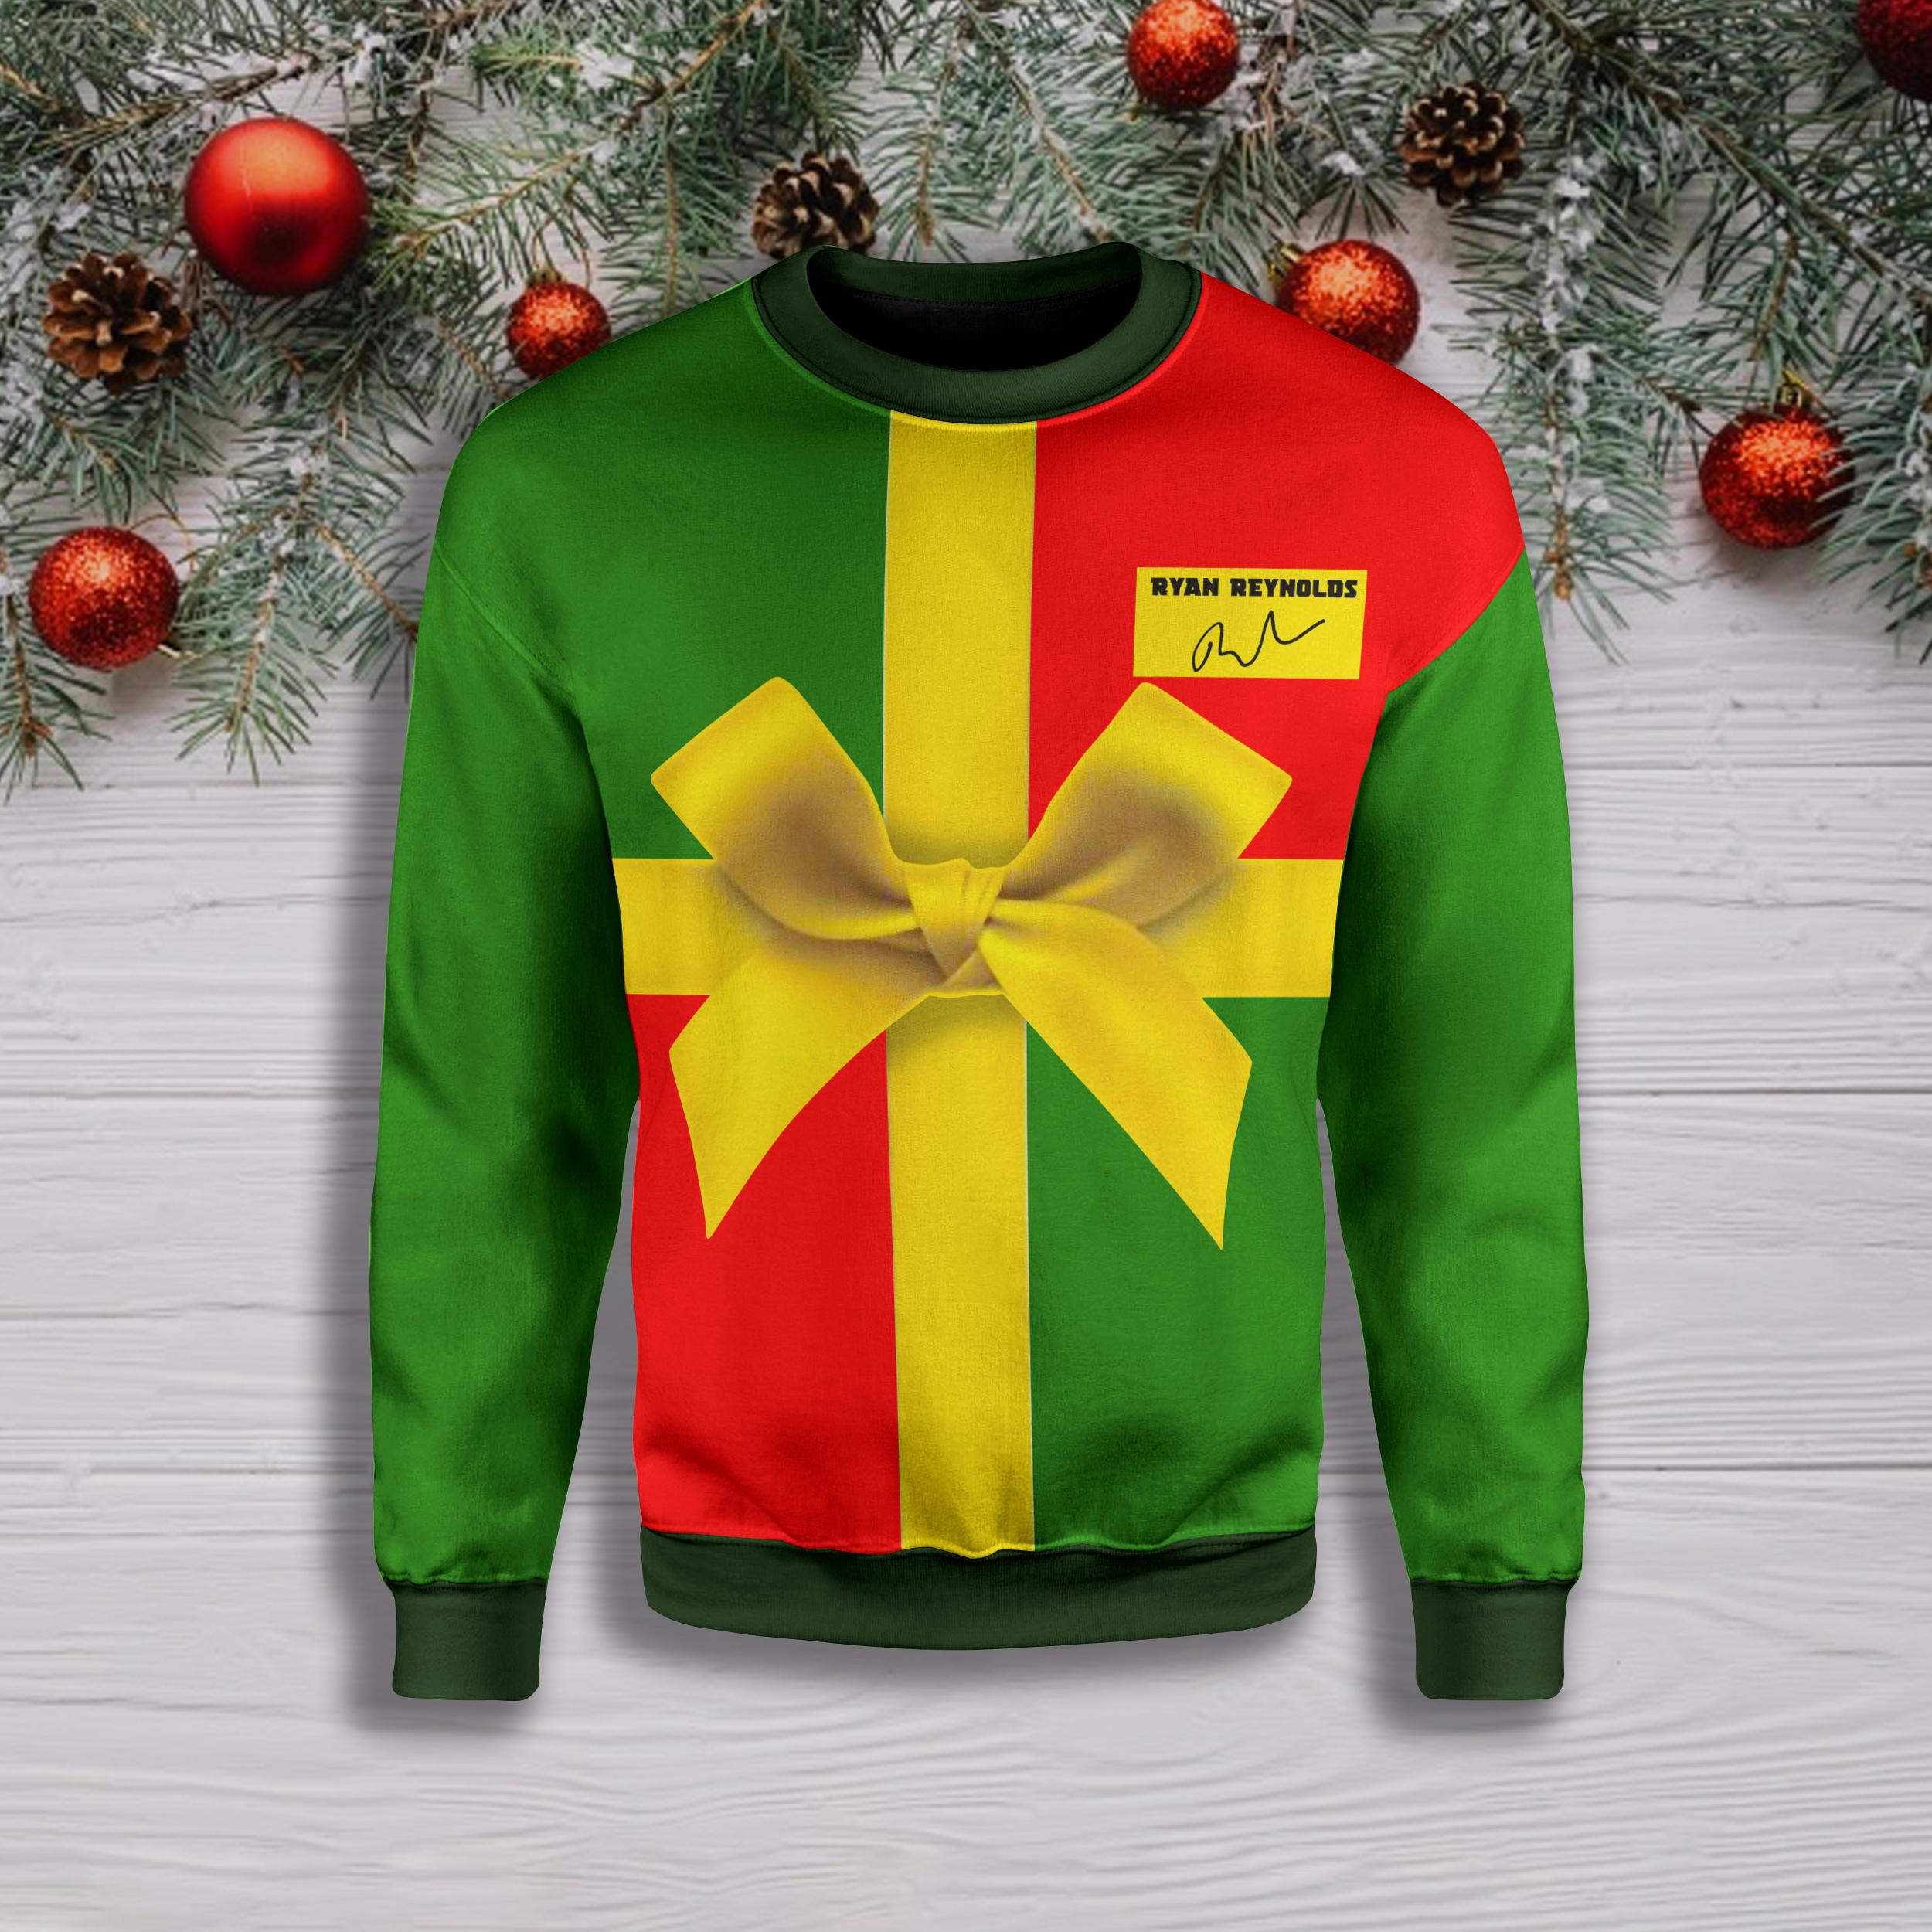 Ryan reynold full printing ugly christmas sweater 3